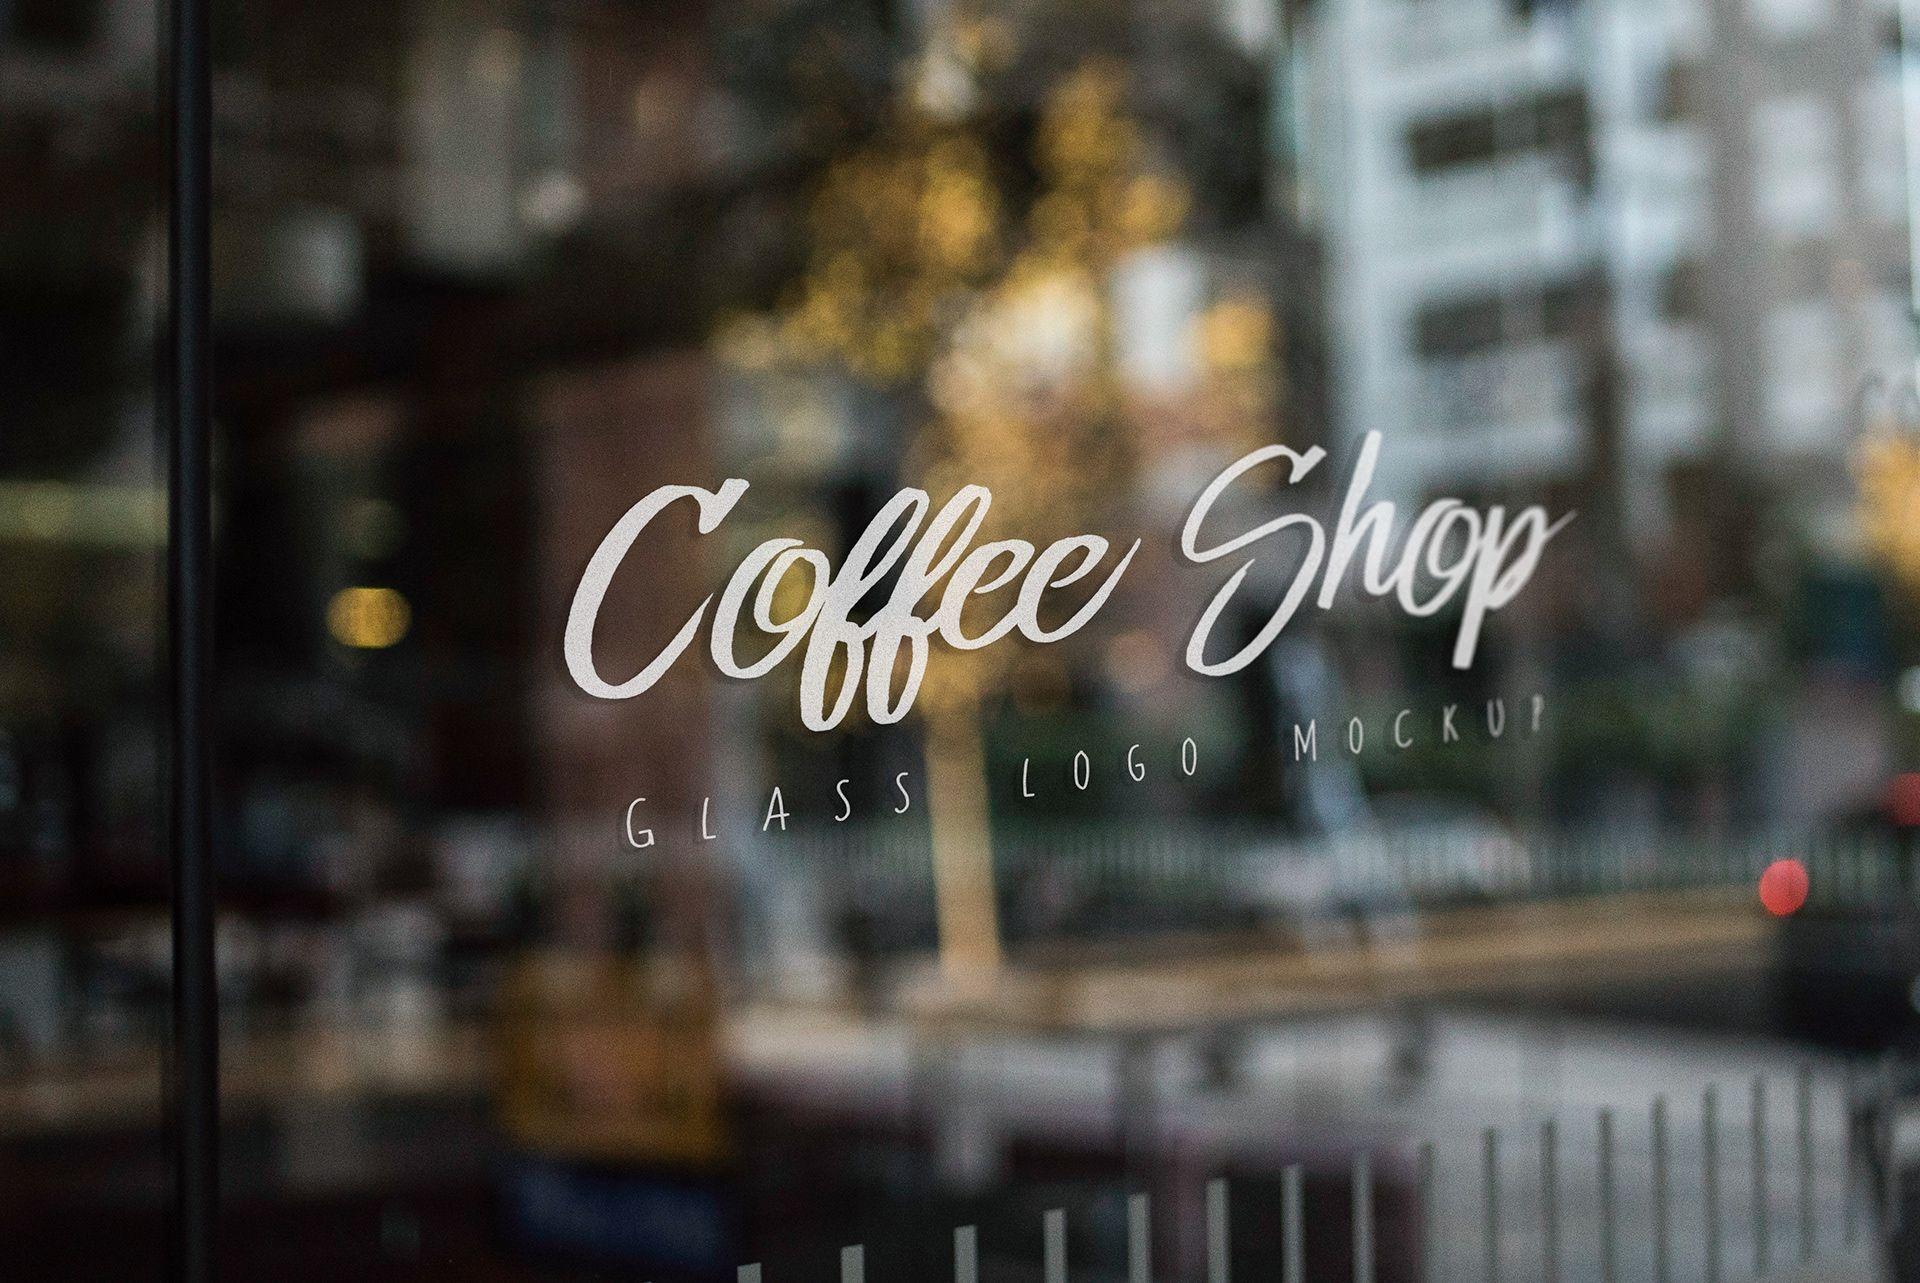 free coffee shop window signage mockup psd